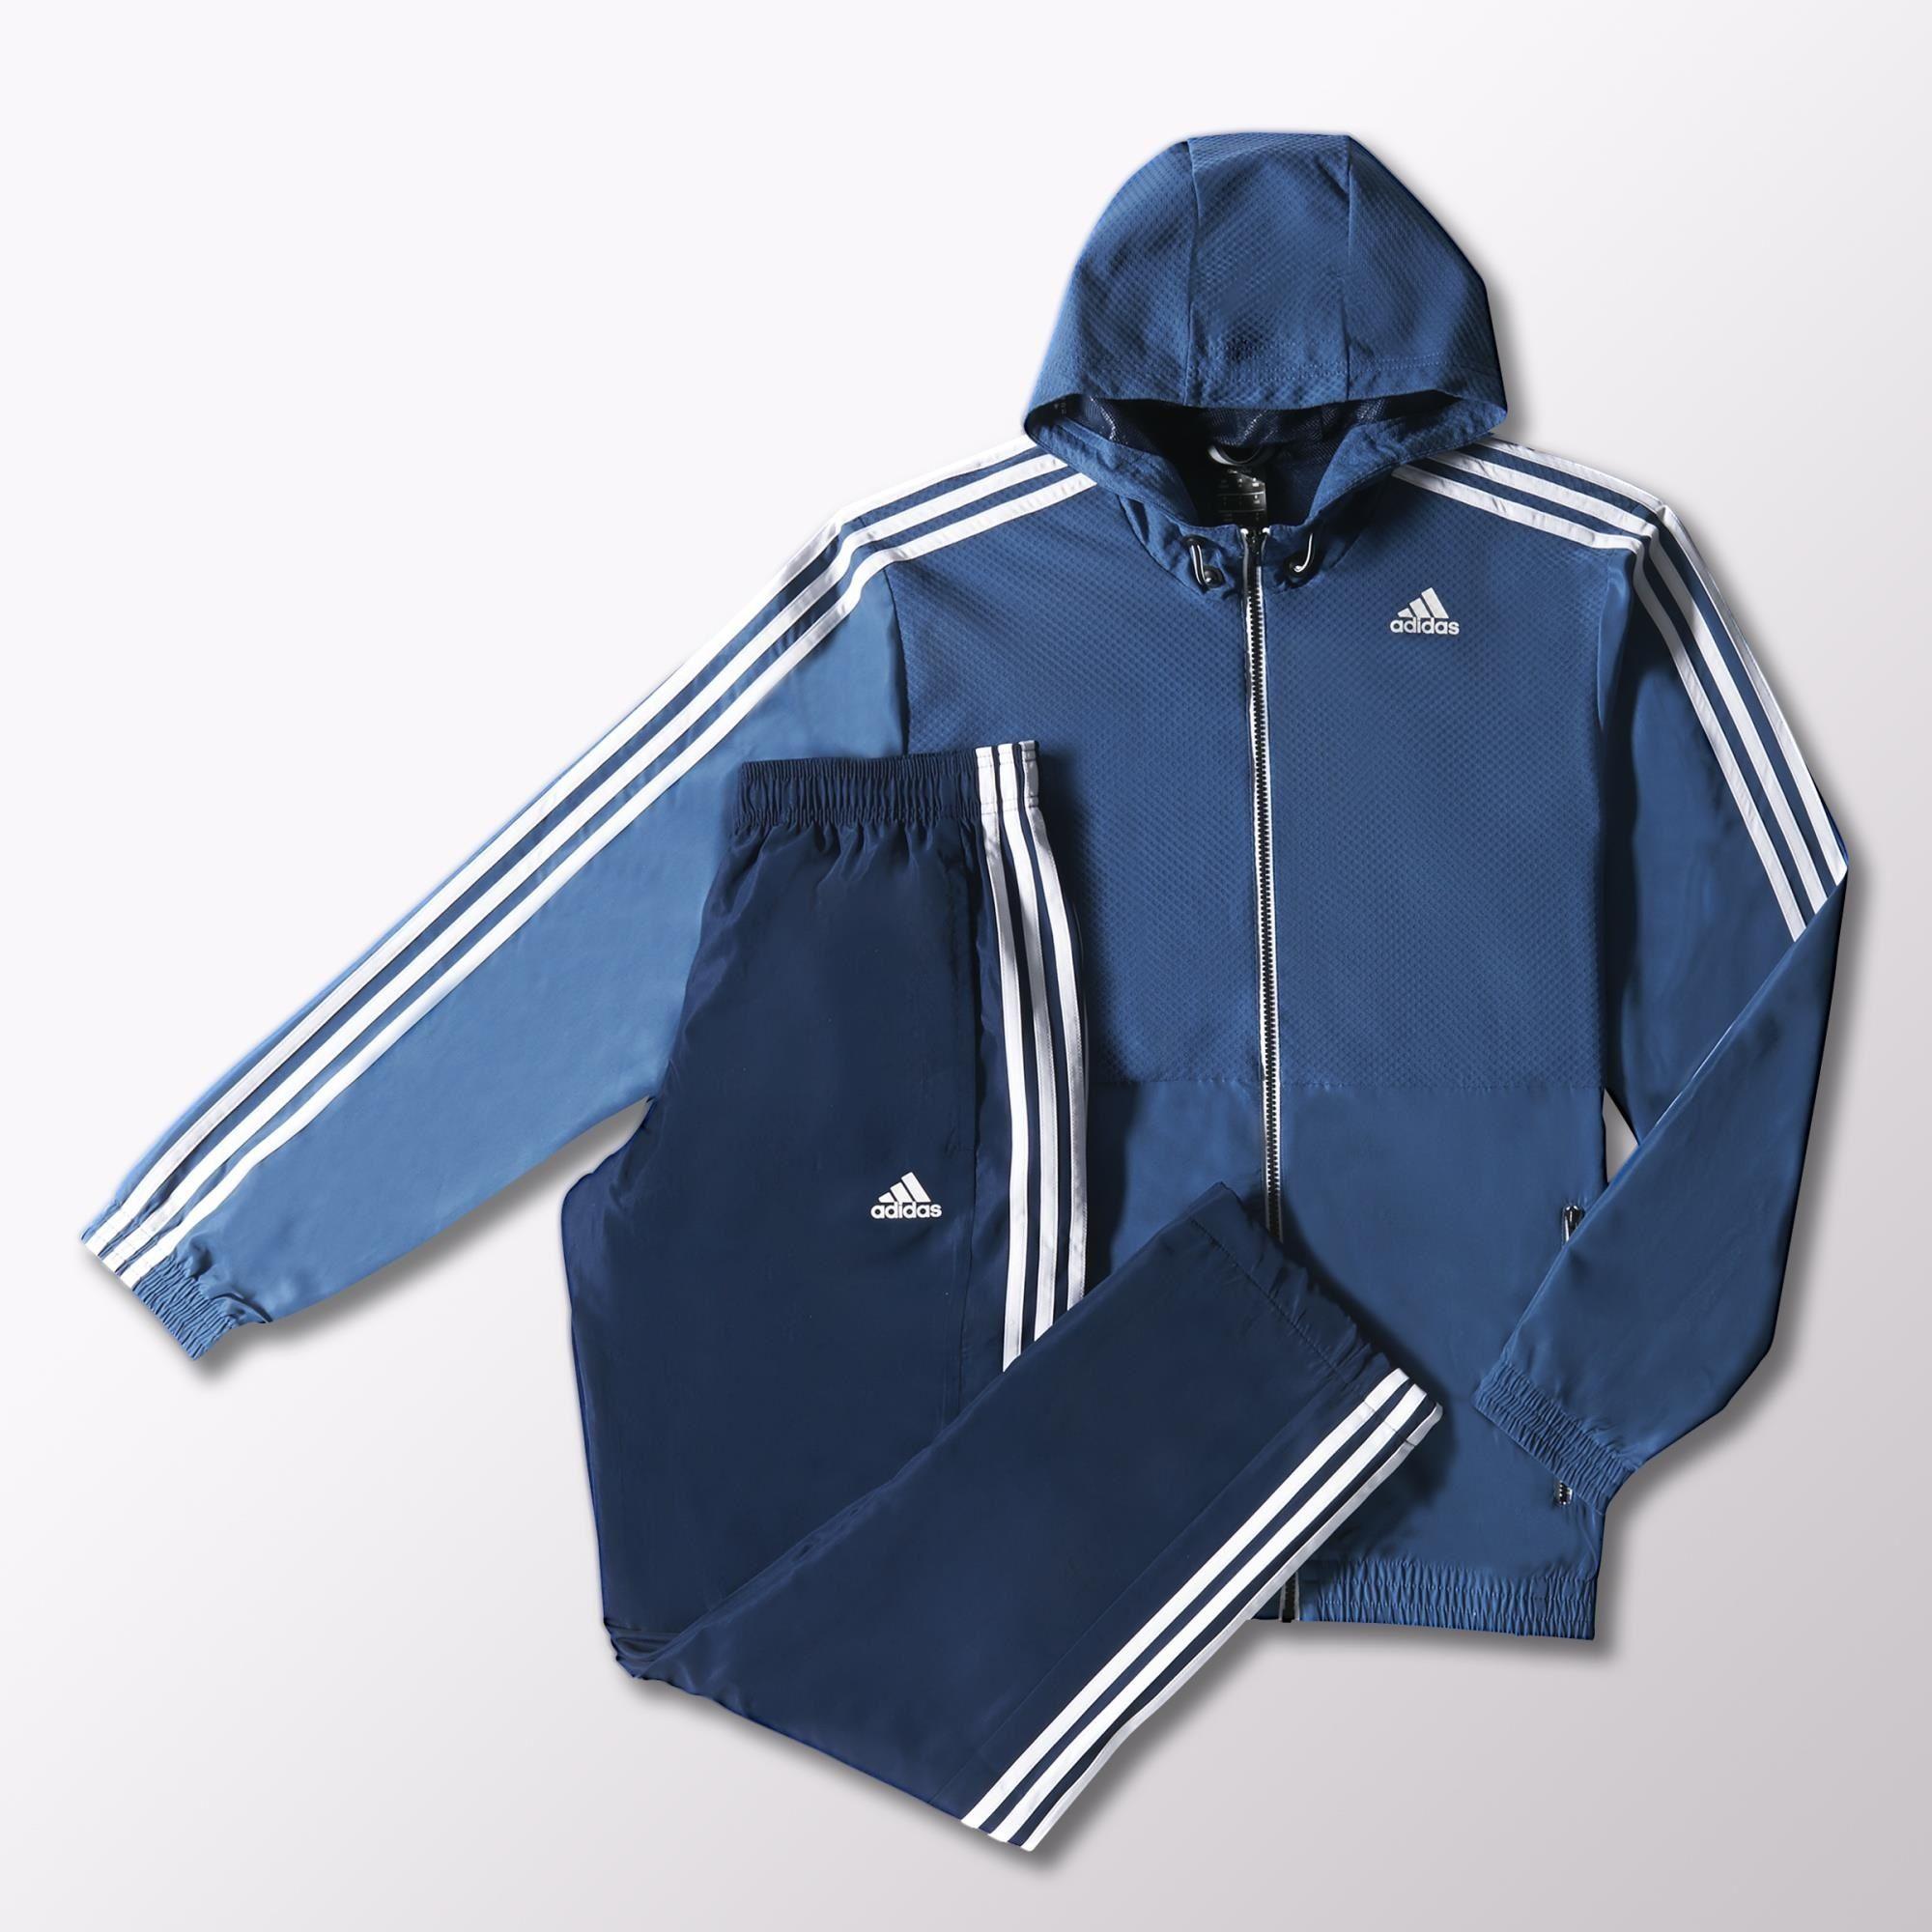 8a60859b9 Adidas Chánadal Hombre Training Climalite (azul/marino/blanco)